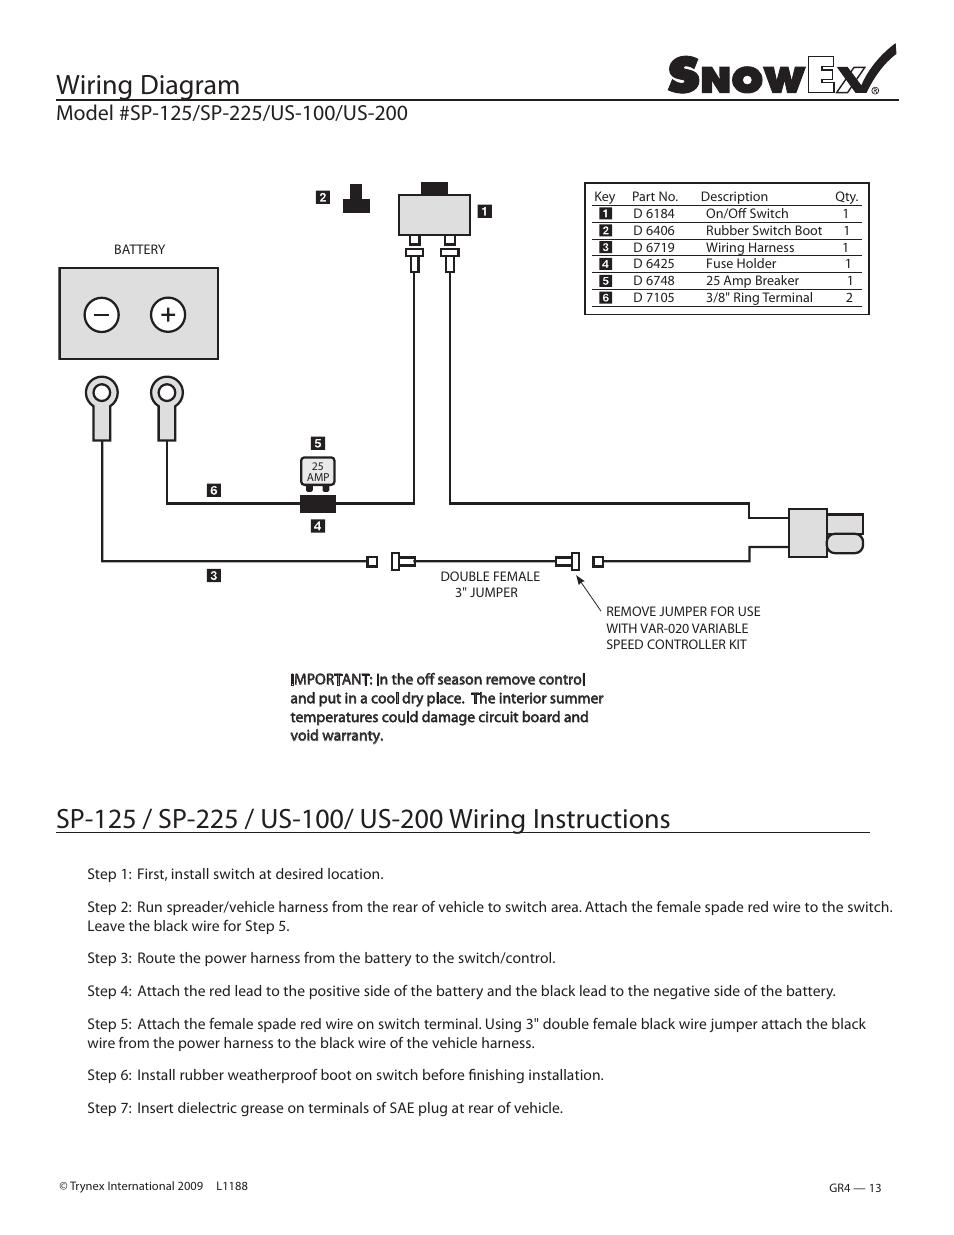 medium resolution of wiring diagram snowex sp 225 us 200 user manual page 13 27